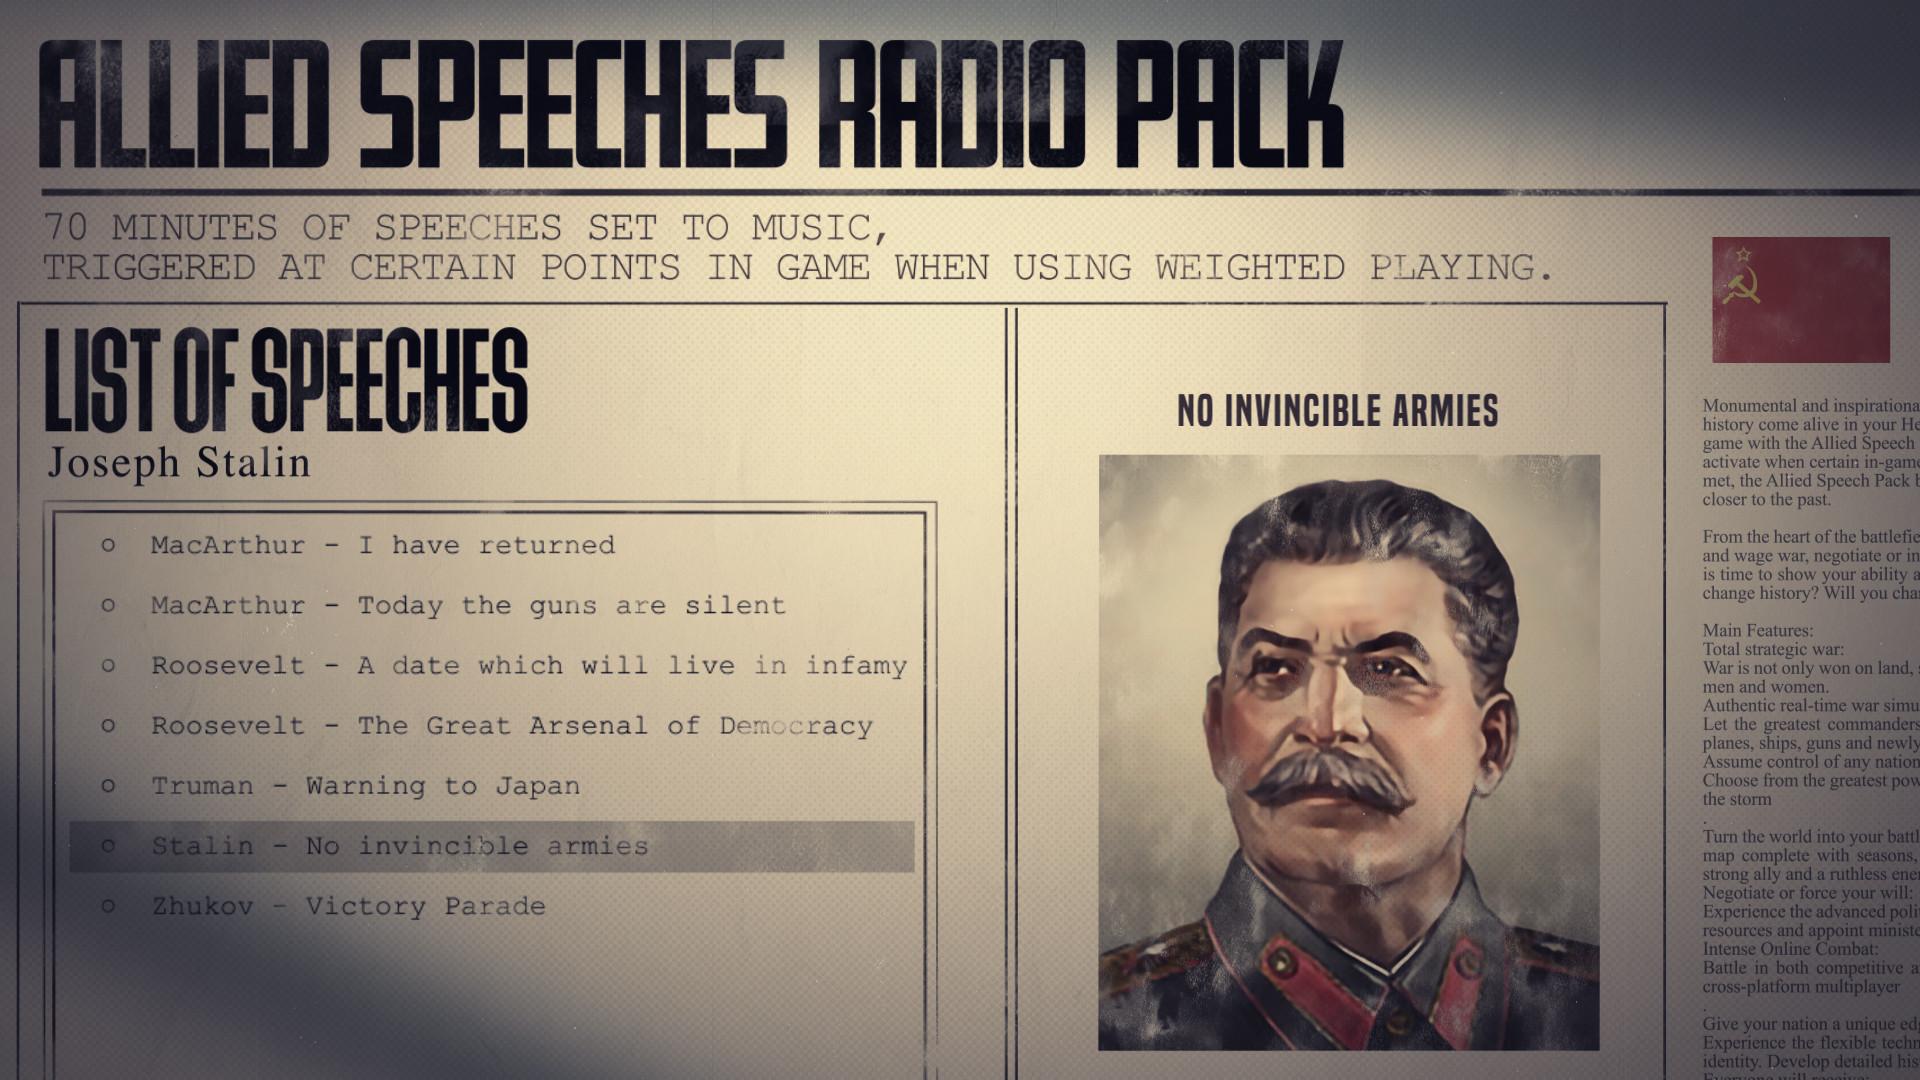 Hearts of Iron IV: Allied Speeches Music Pack PC Key Fiyatları